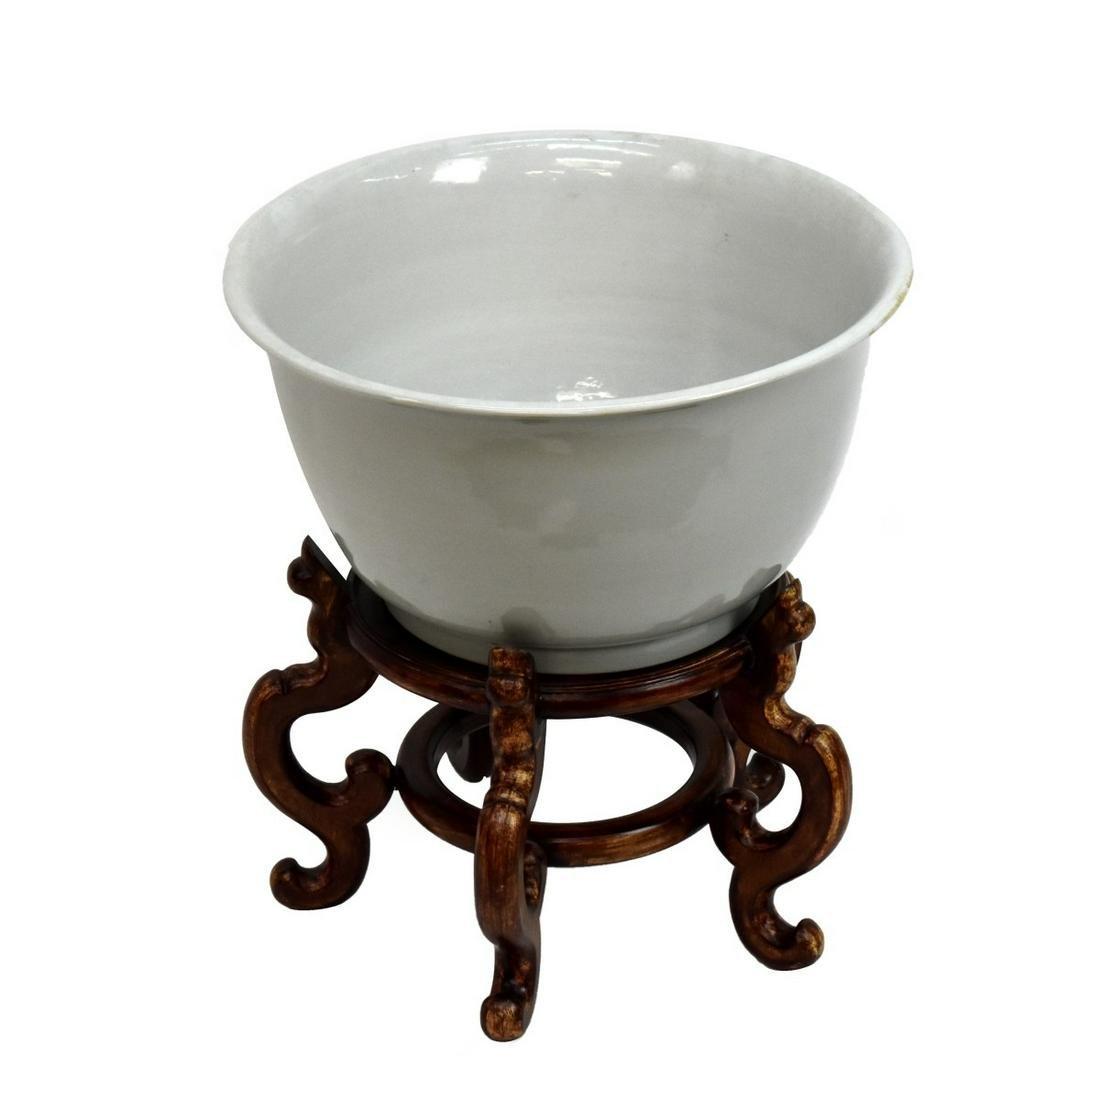 20th C. Chinese Blanc de Chine Flower Pot